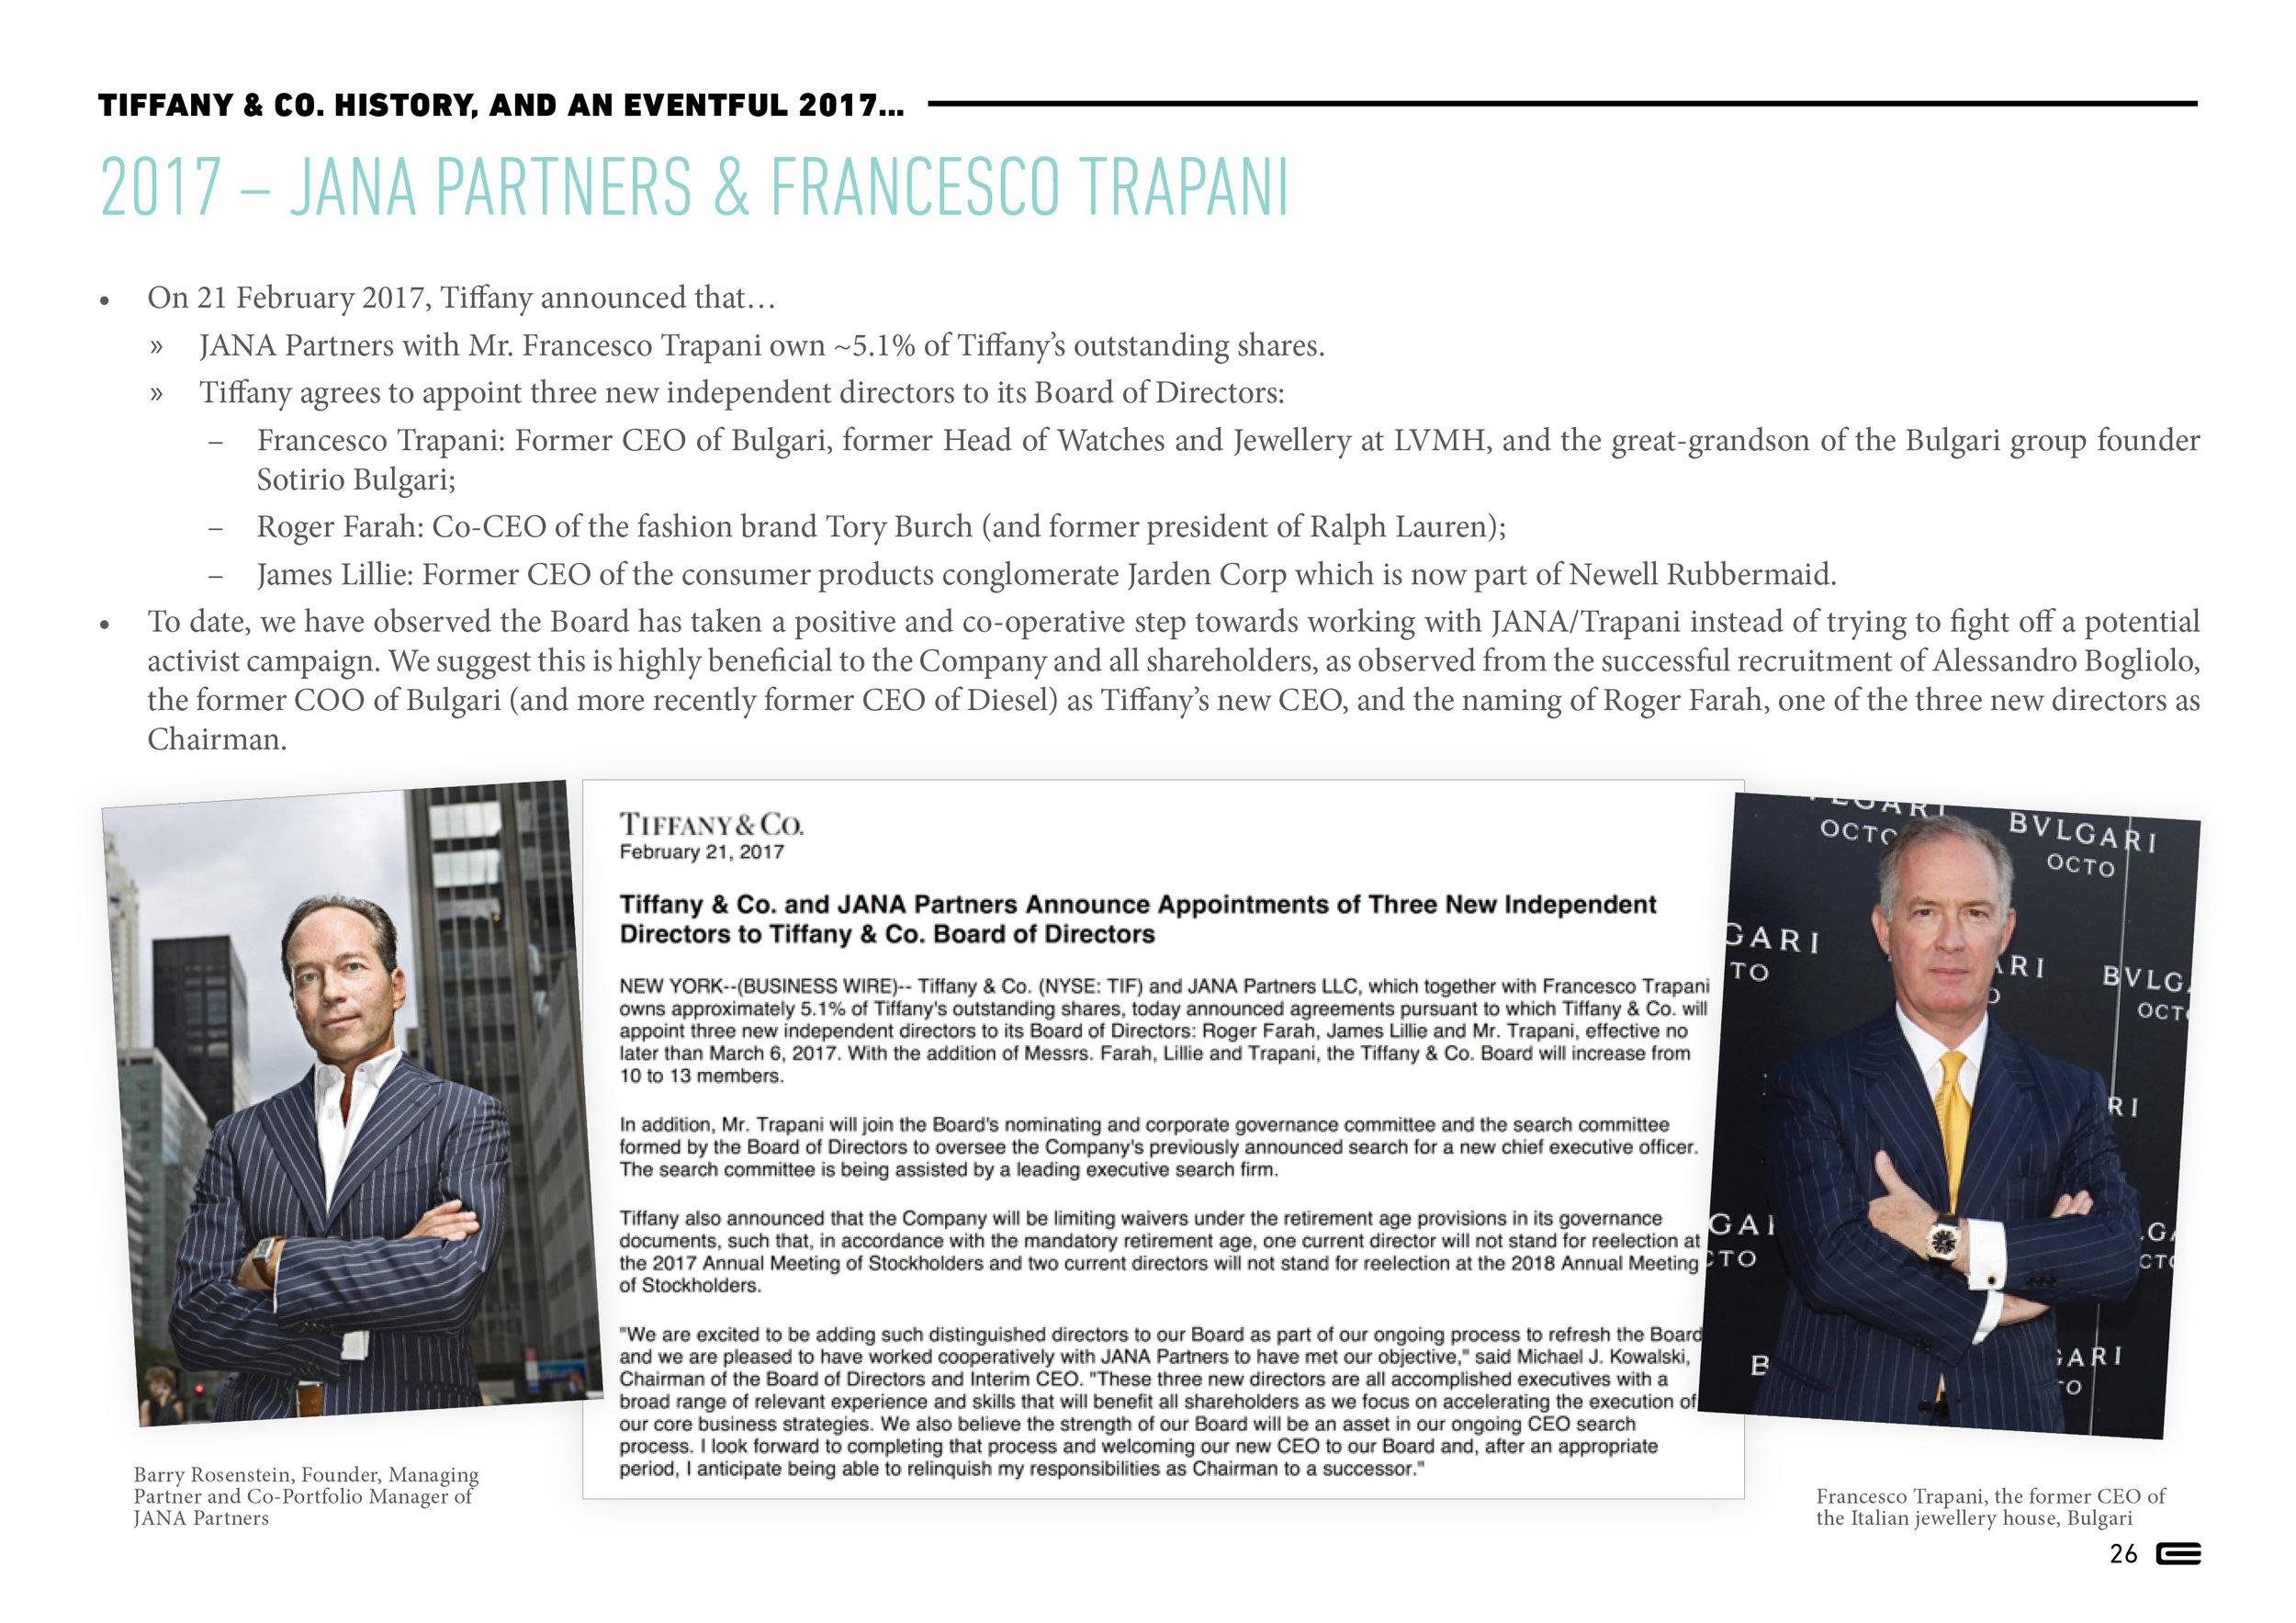 EC - VIC 2018 Presentation on Tiffany26.jpg